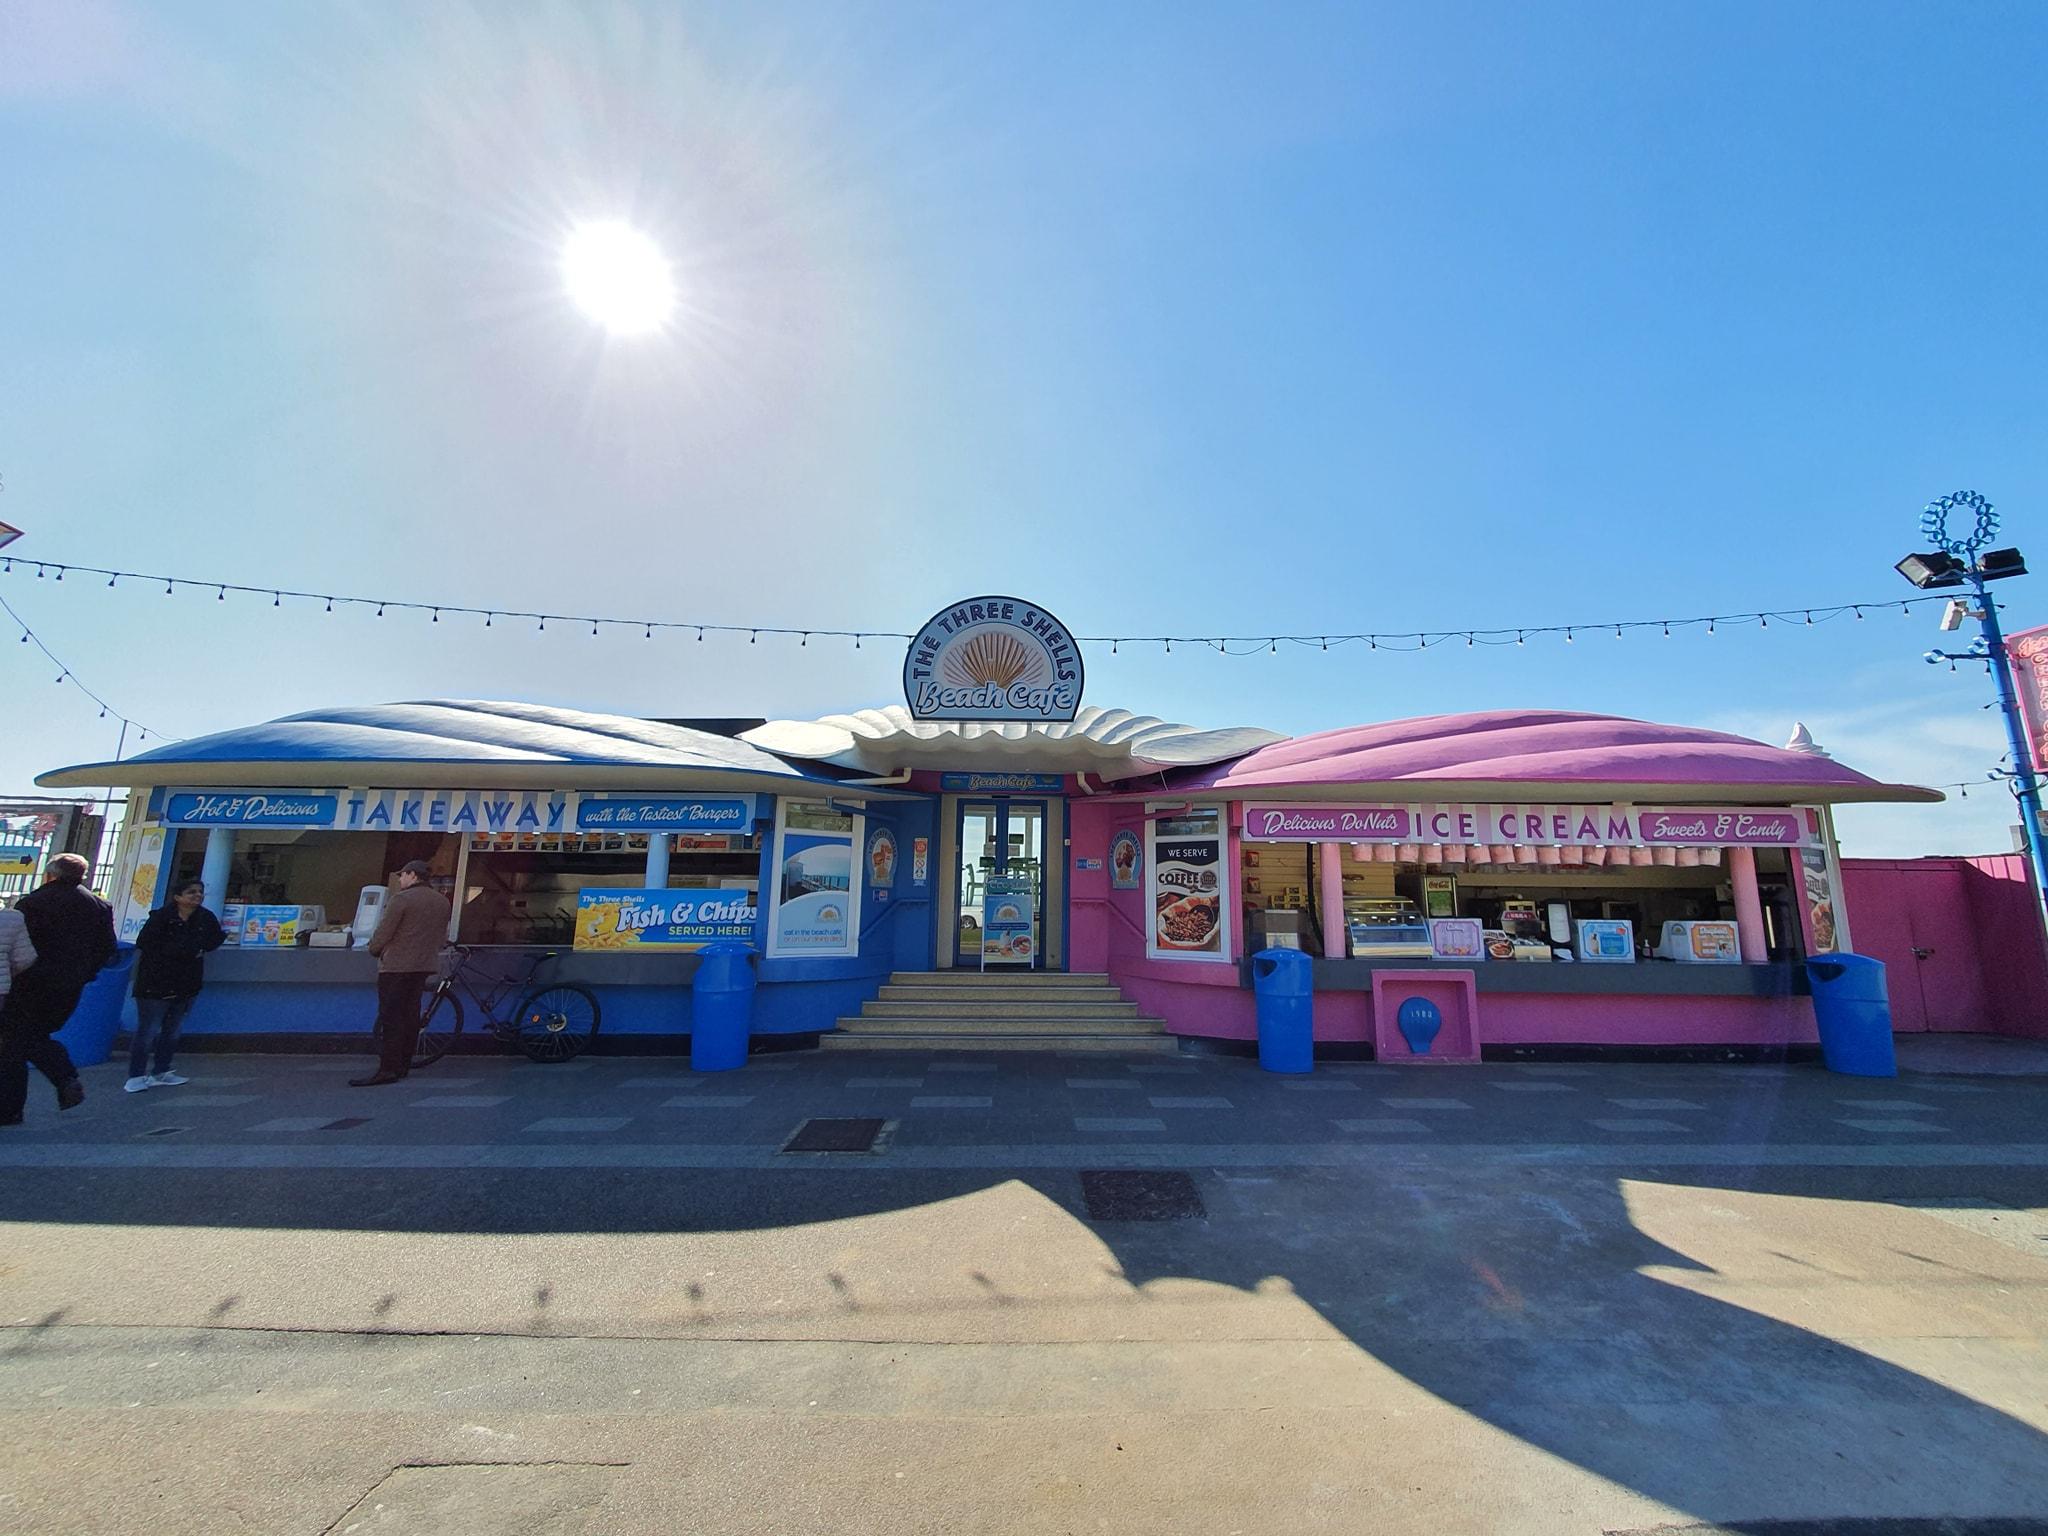 The Three Shells Cafe